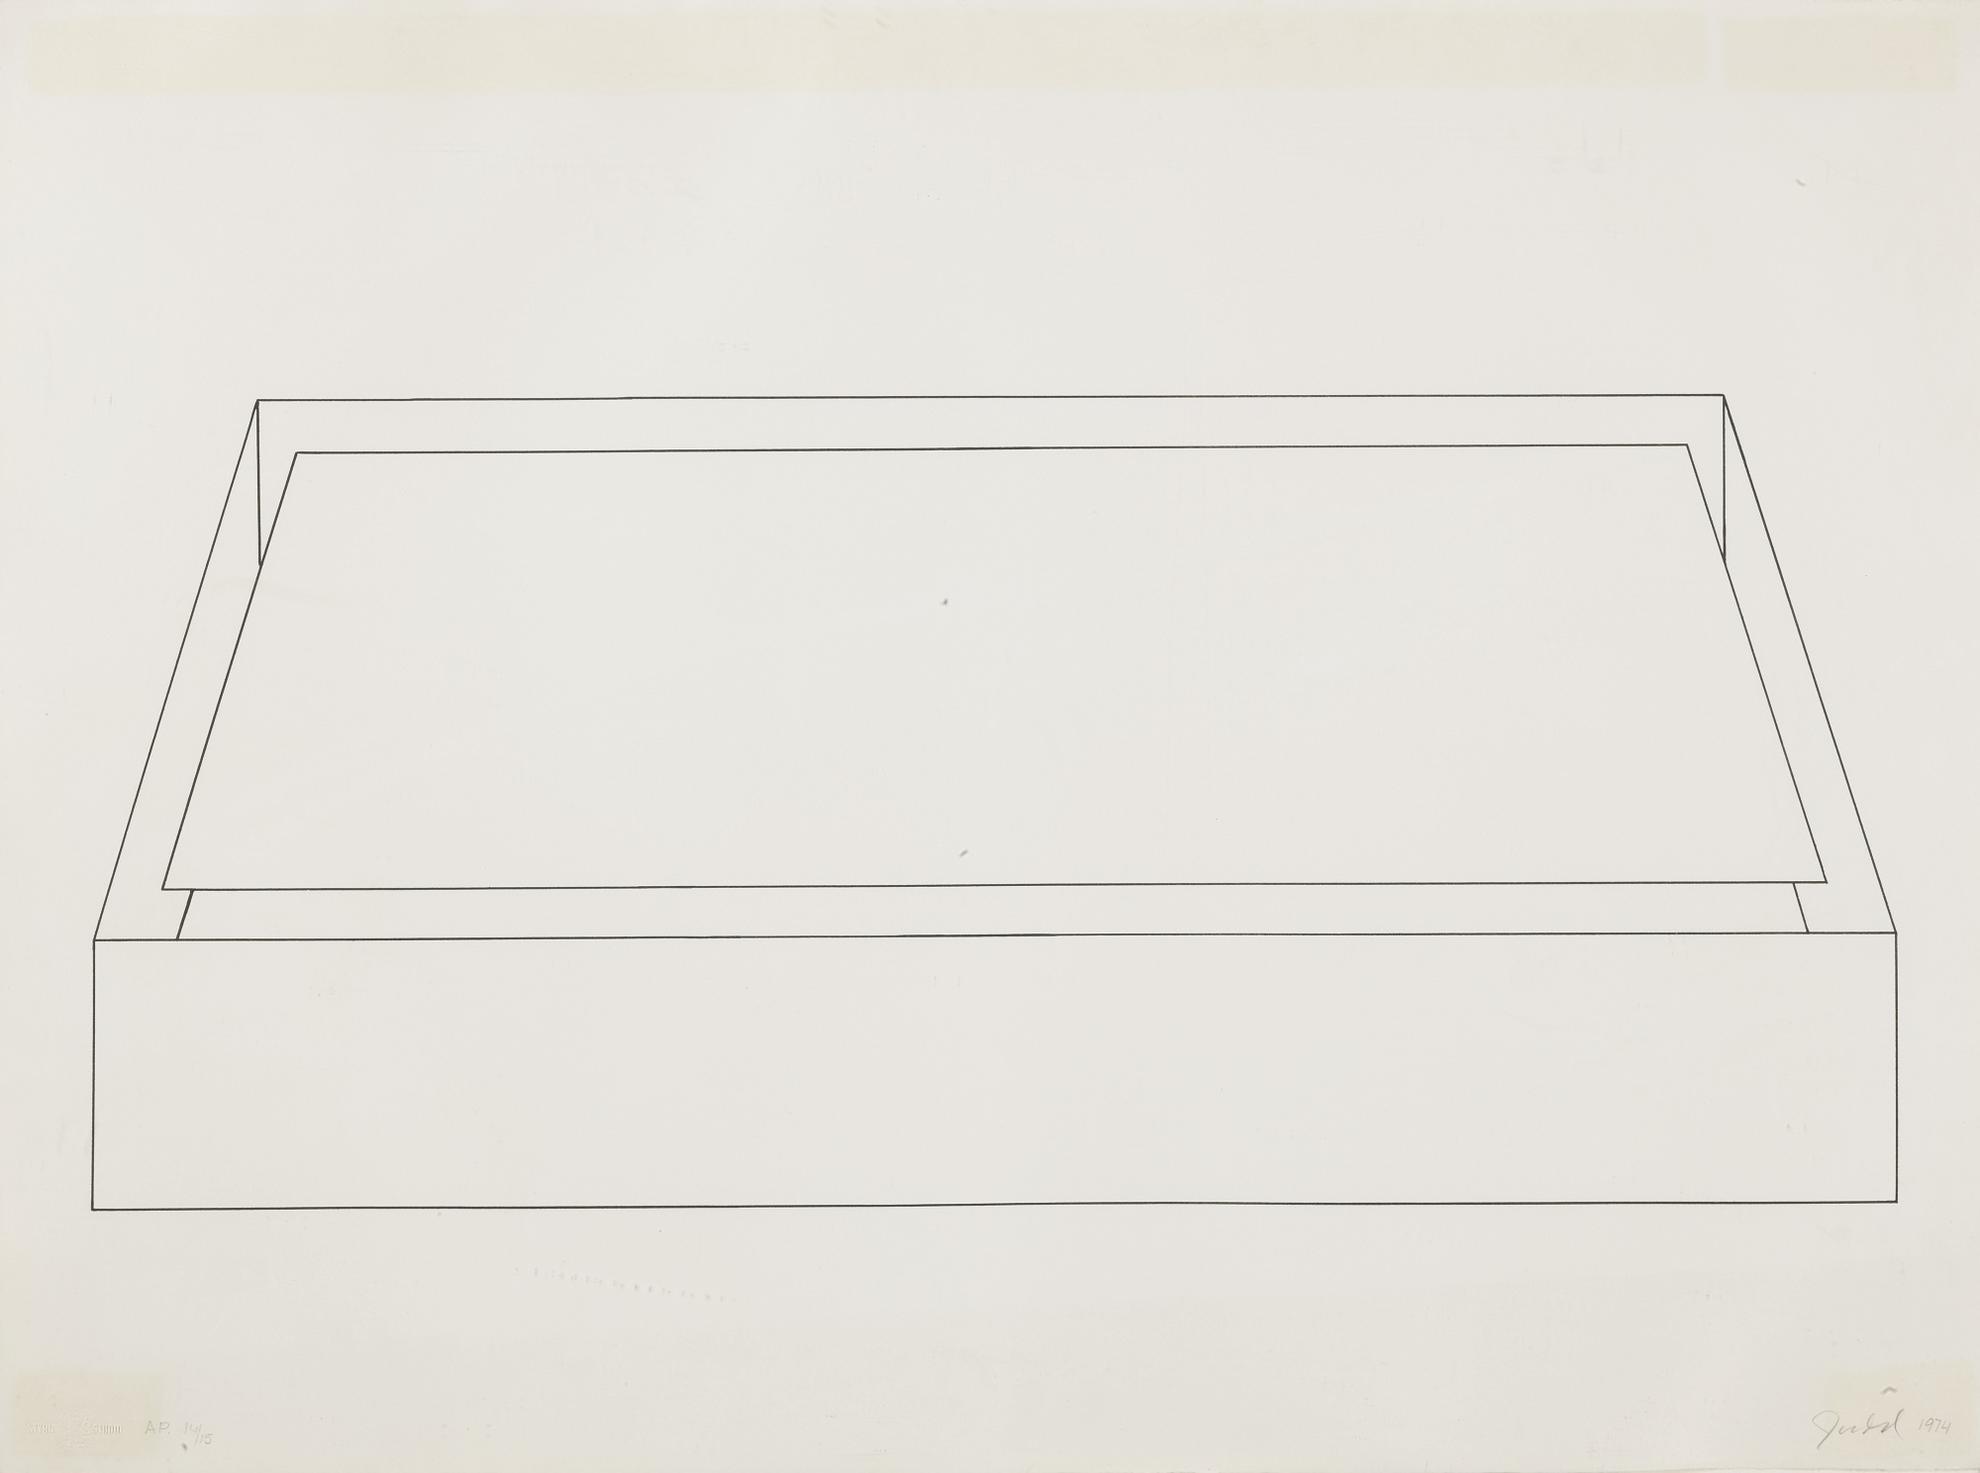 Donald Judd-Untitled (Schellmann 83)-1974